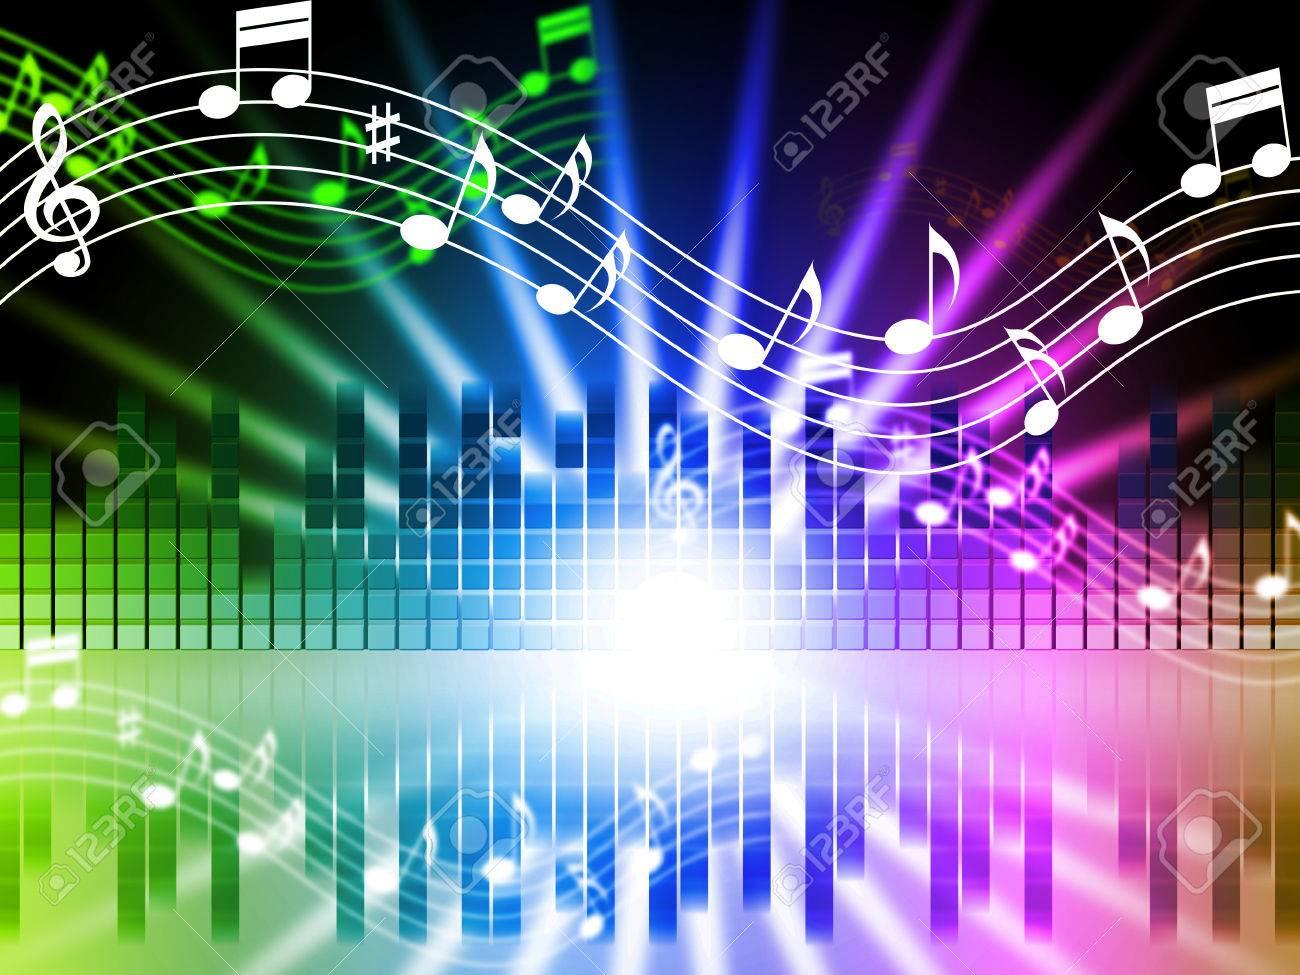 Significado de fondo musical